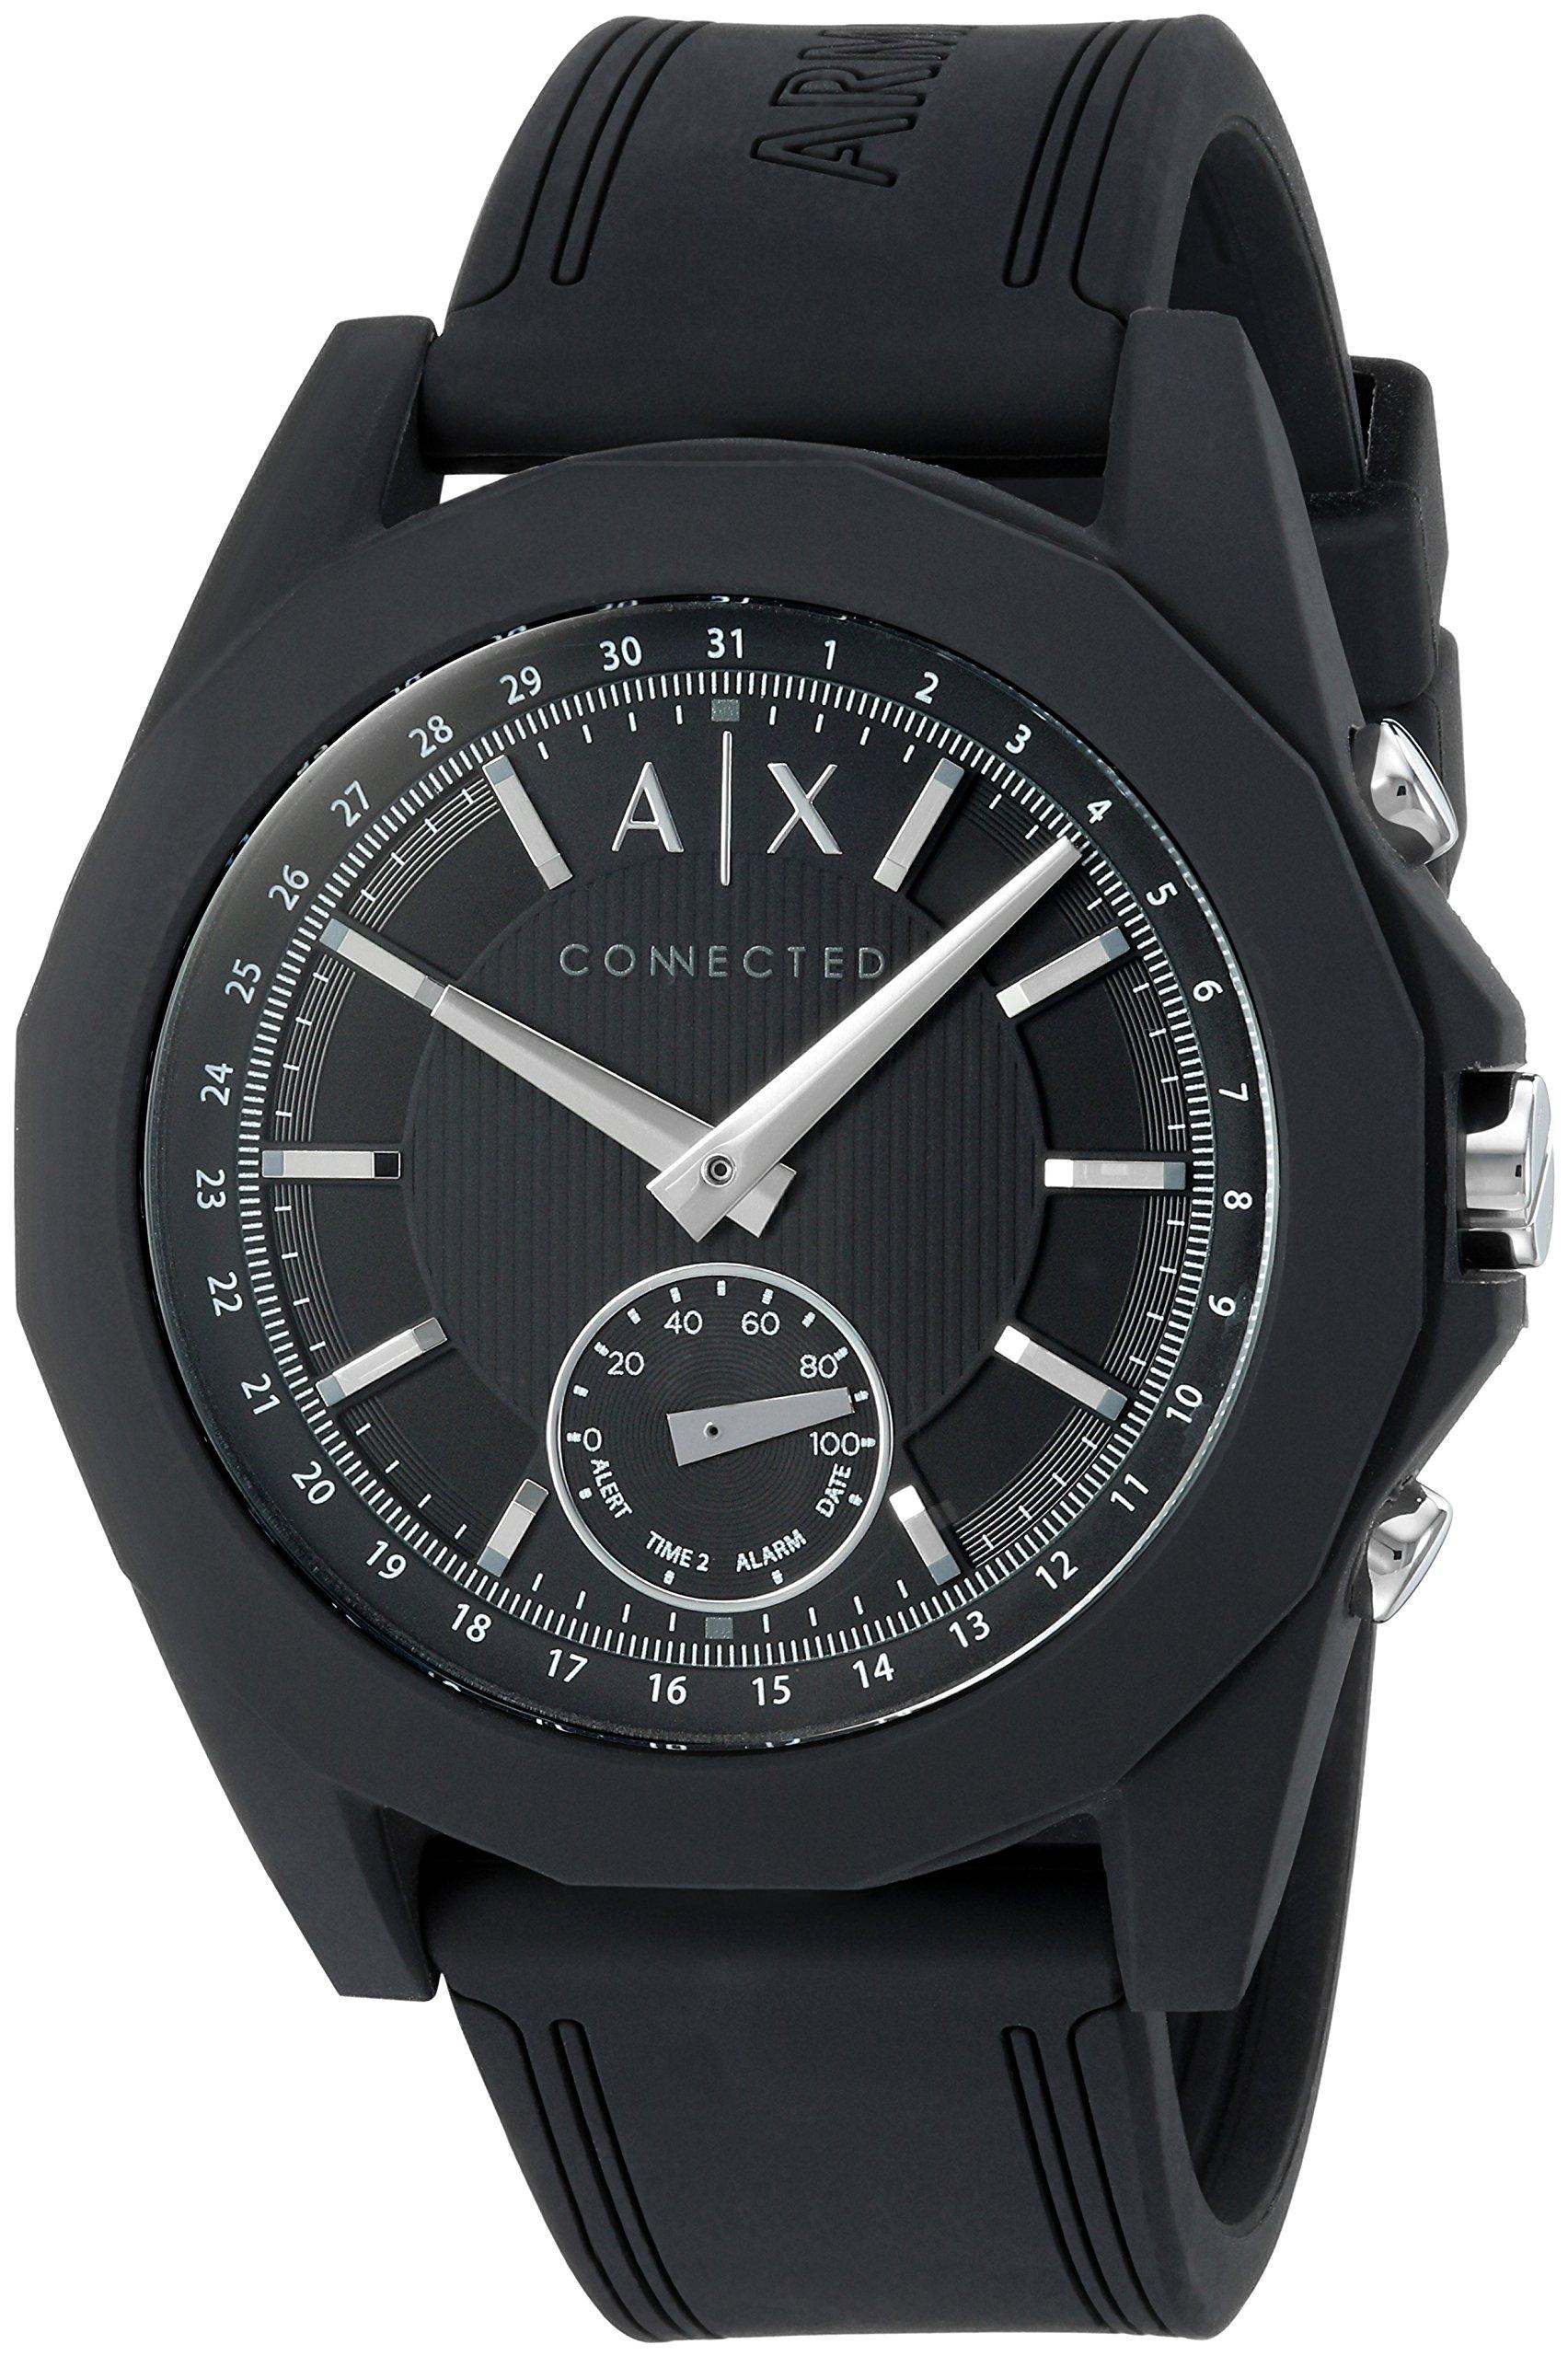 Armani Exchange Men's 'Drexler' Quartz Resin and Silicone Smart Watch, Color:Black (Model: AXT1001)